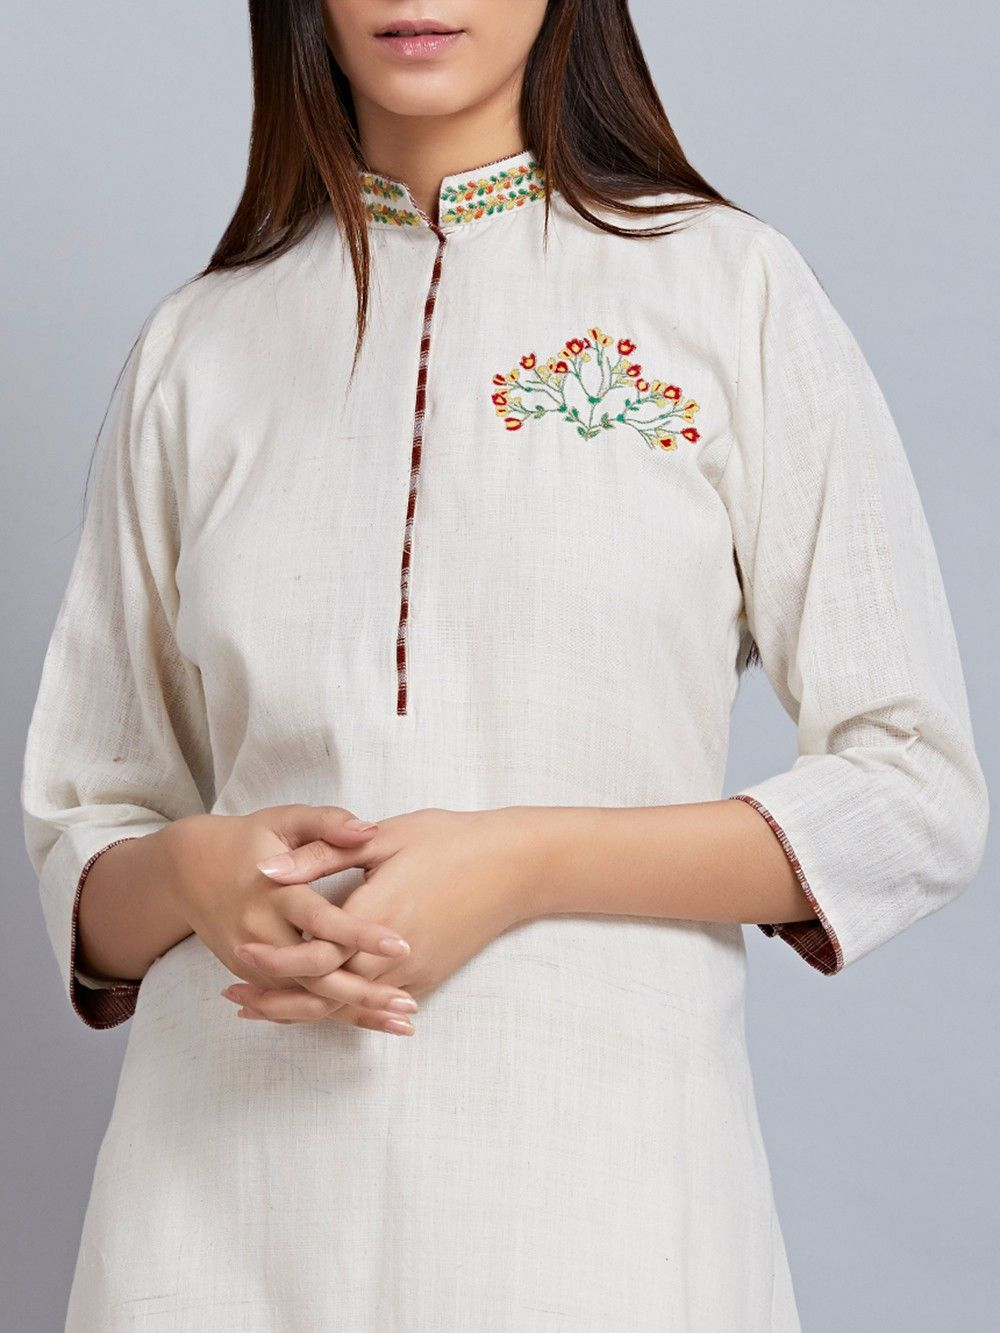 Buy Off White Khadi Cotton Embroidered Kurta online at